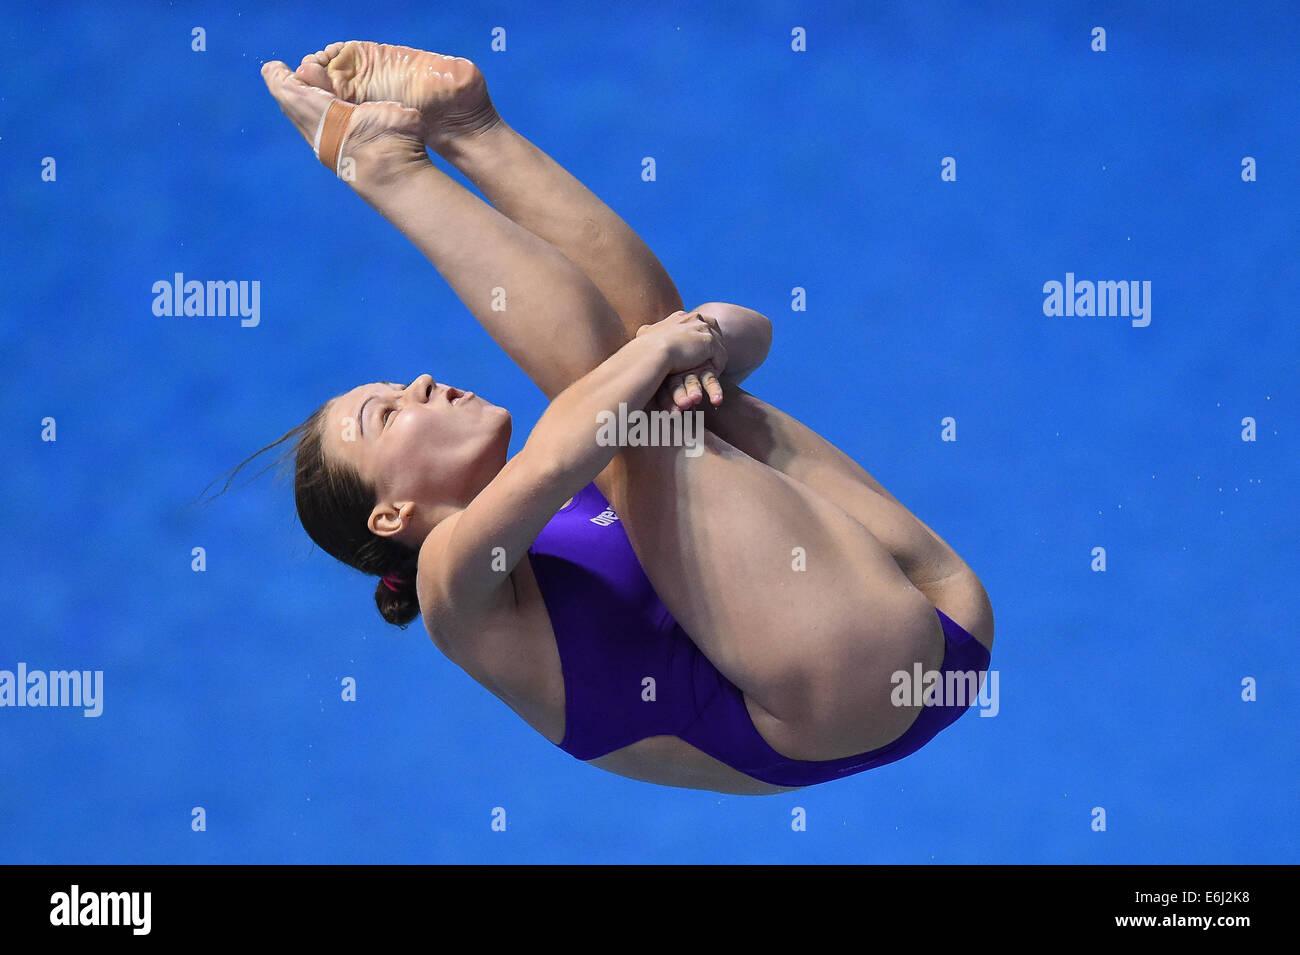 Berlin, Germany. 24th Aug, 2014. Viktoriya Kesar of Ukraine competes at the women's diving 3m springboard final - Stock Image